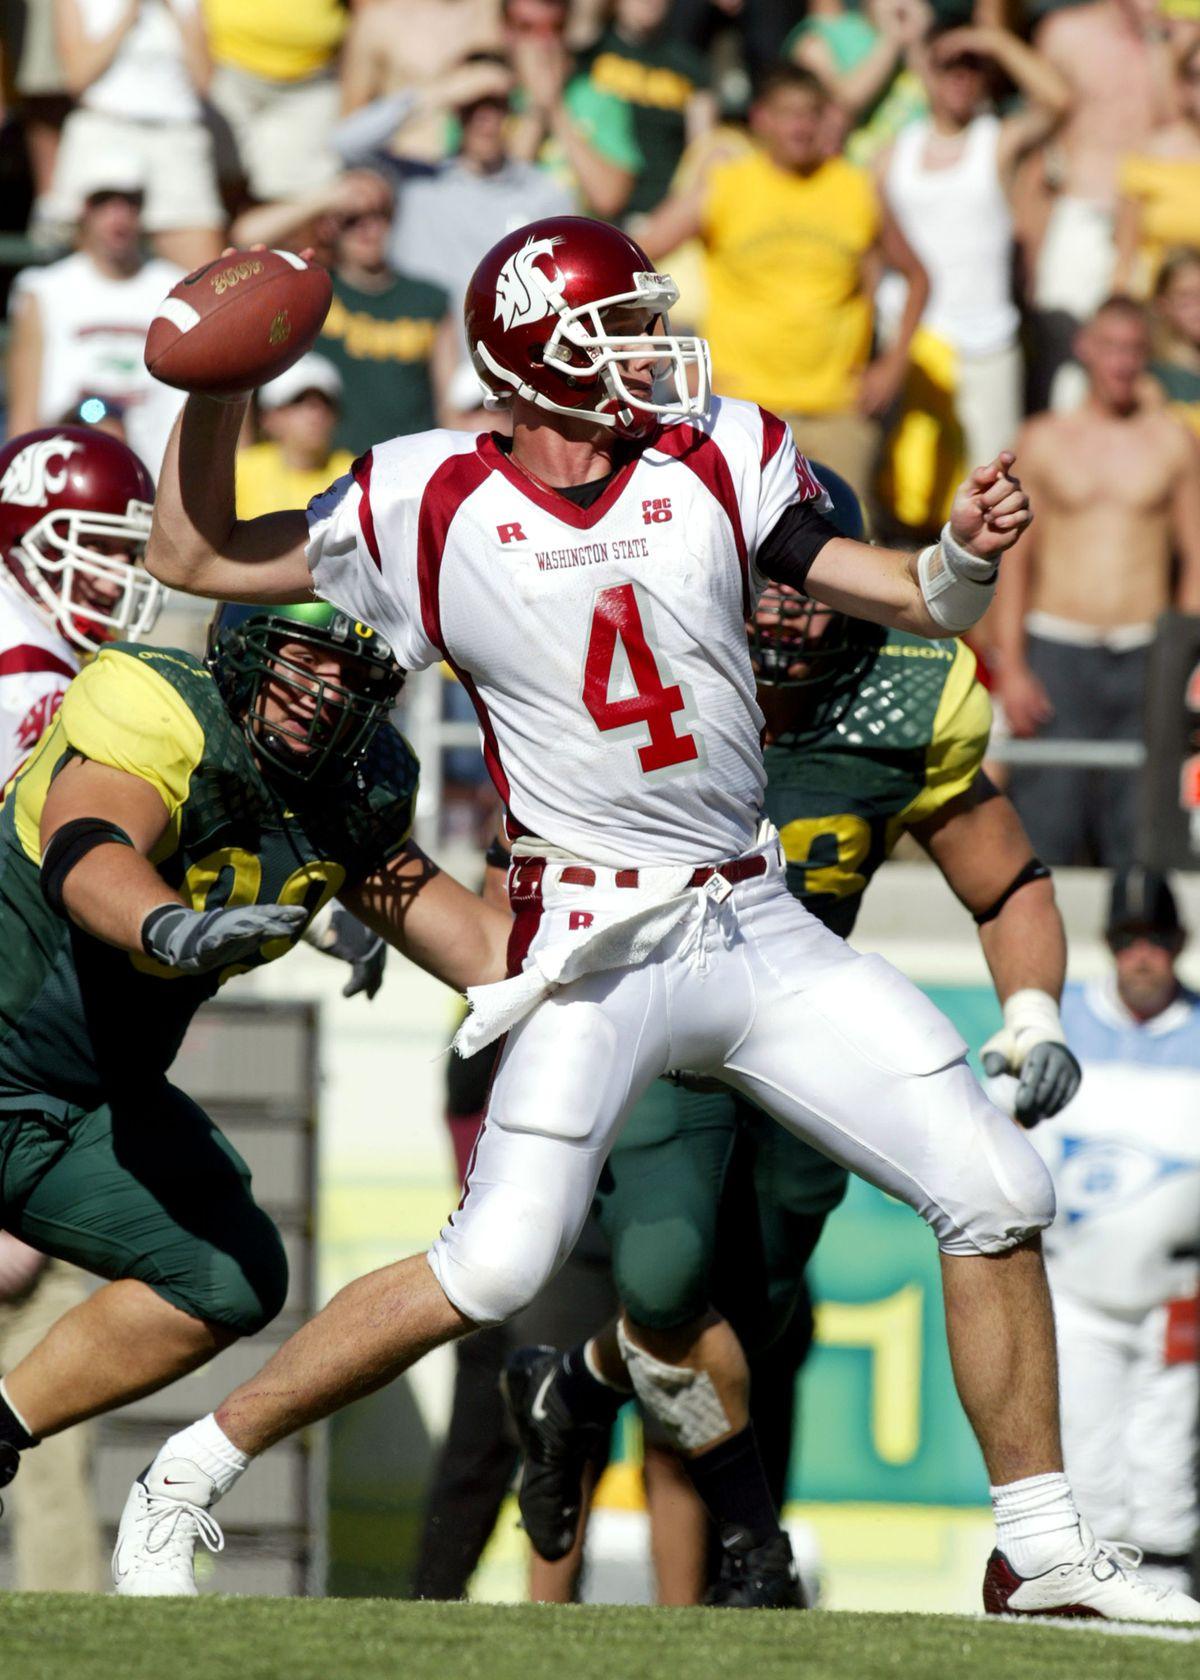 Washington State  vs Oregon September 27, 2003